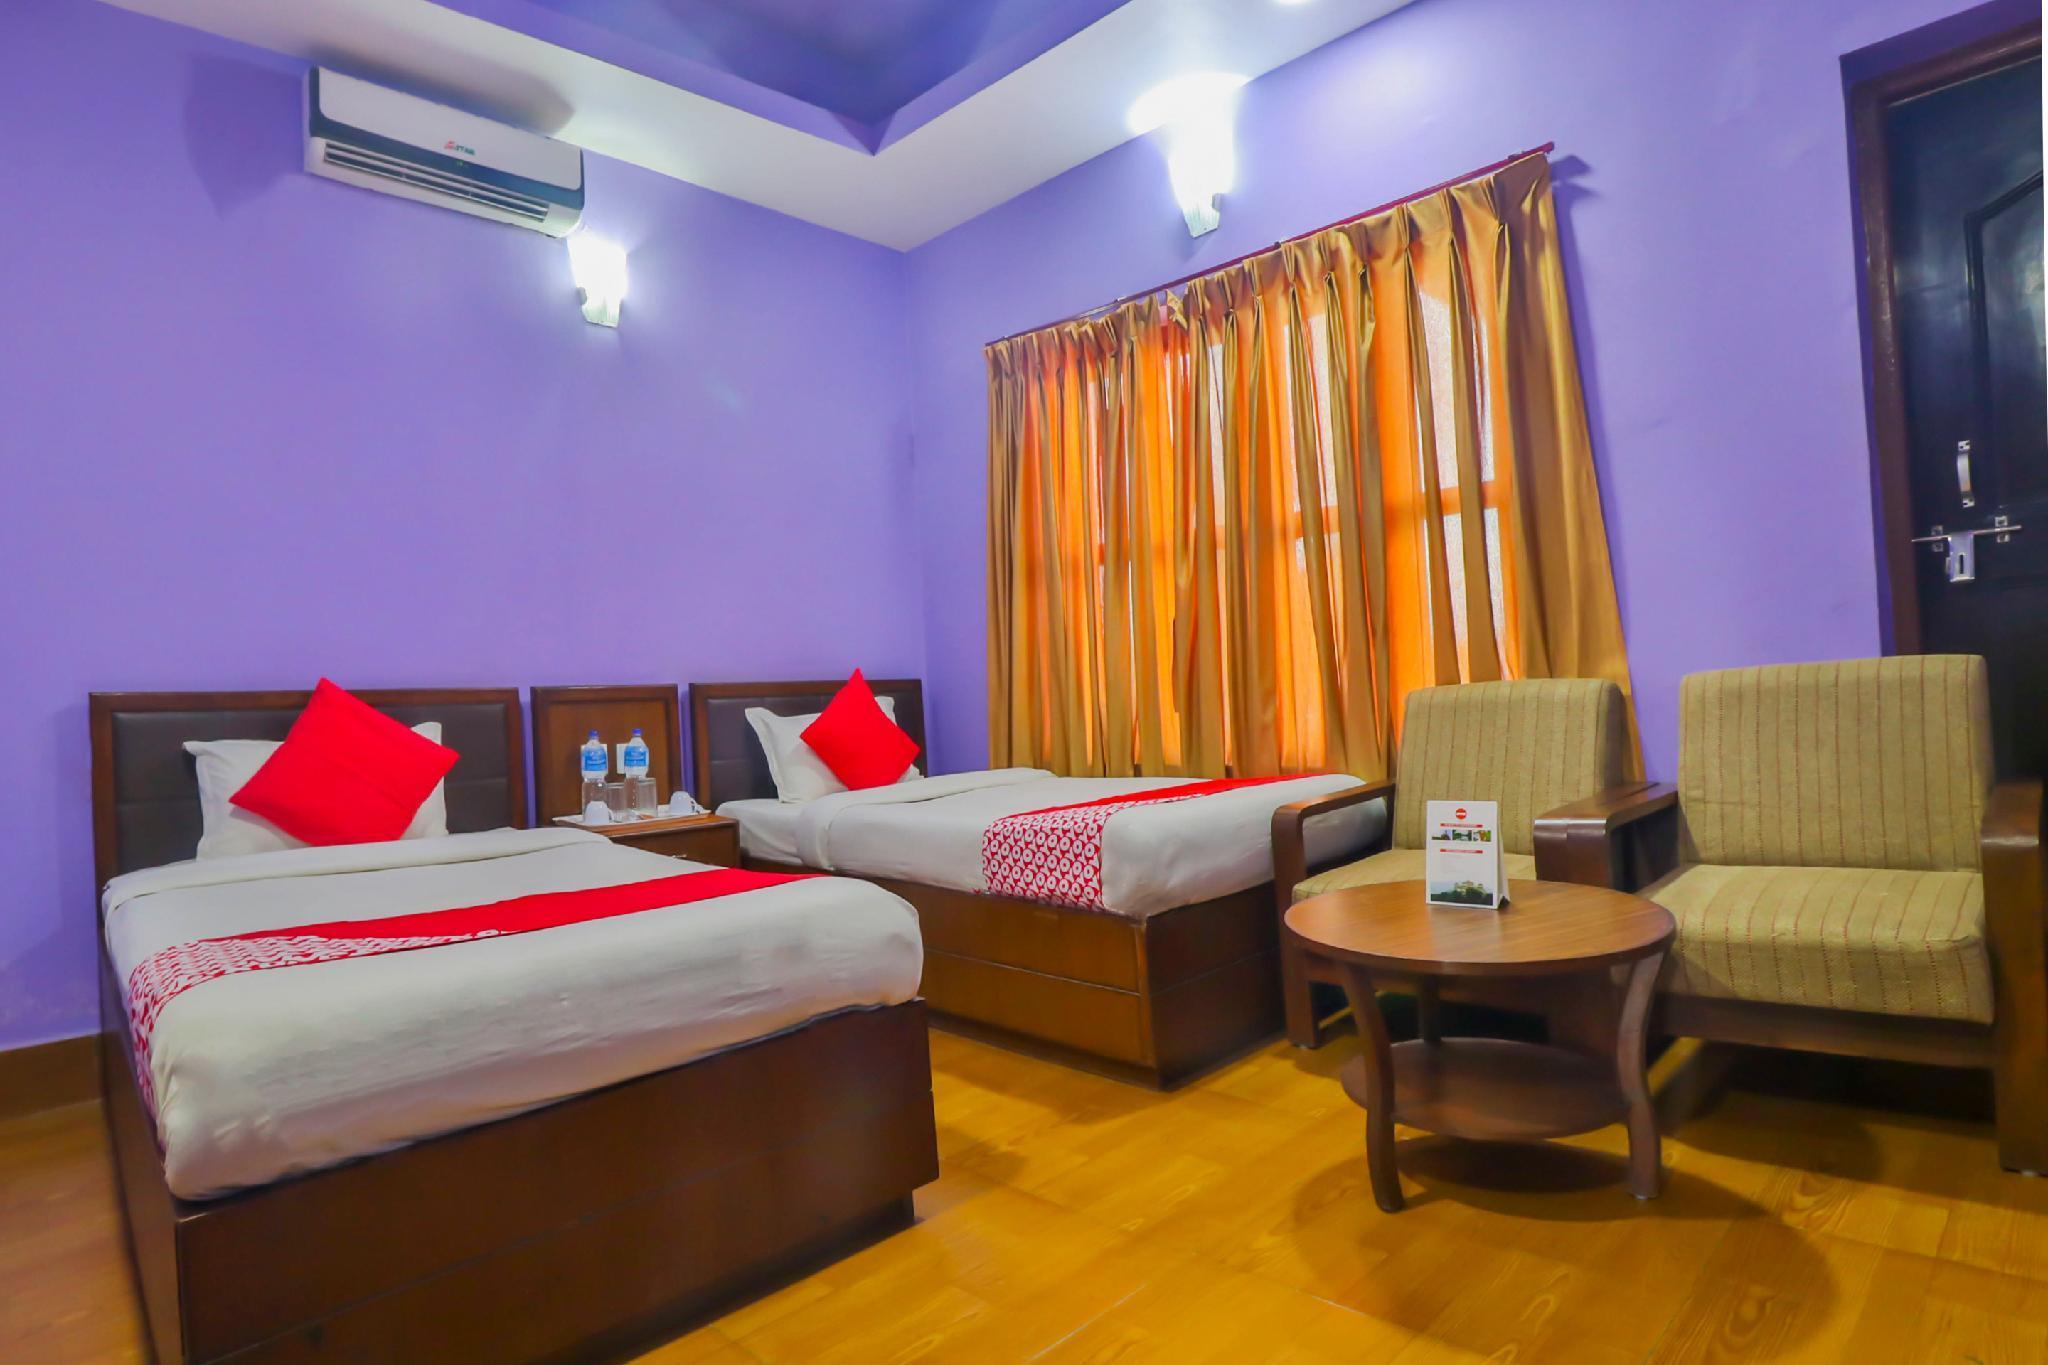 OYO 600 Hotel Star Banquet  pvt.  Ltd.